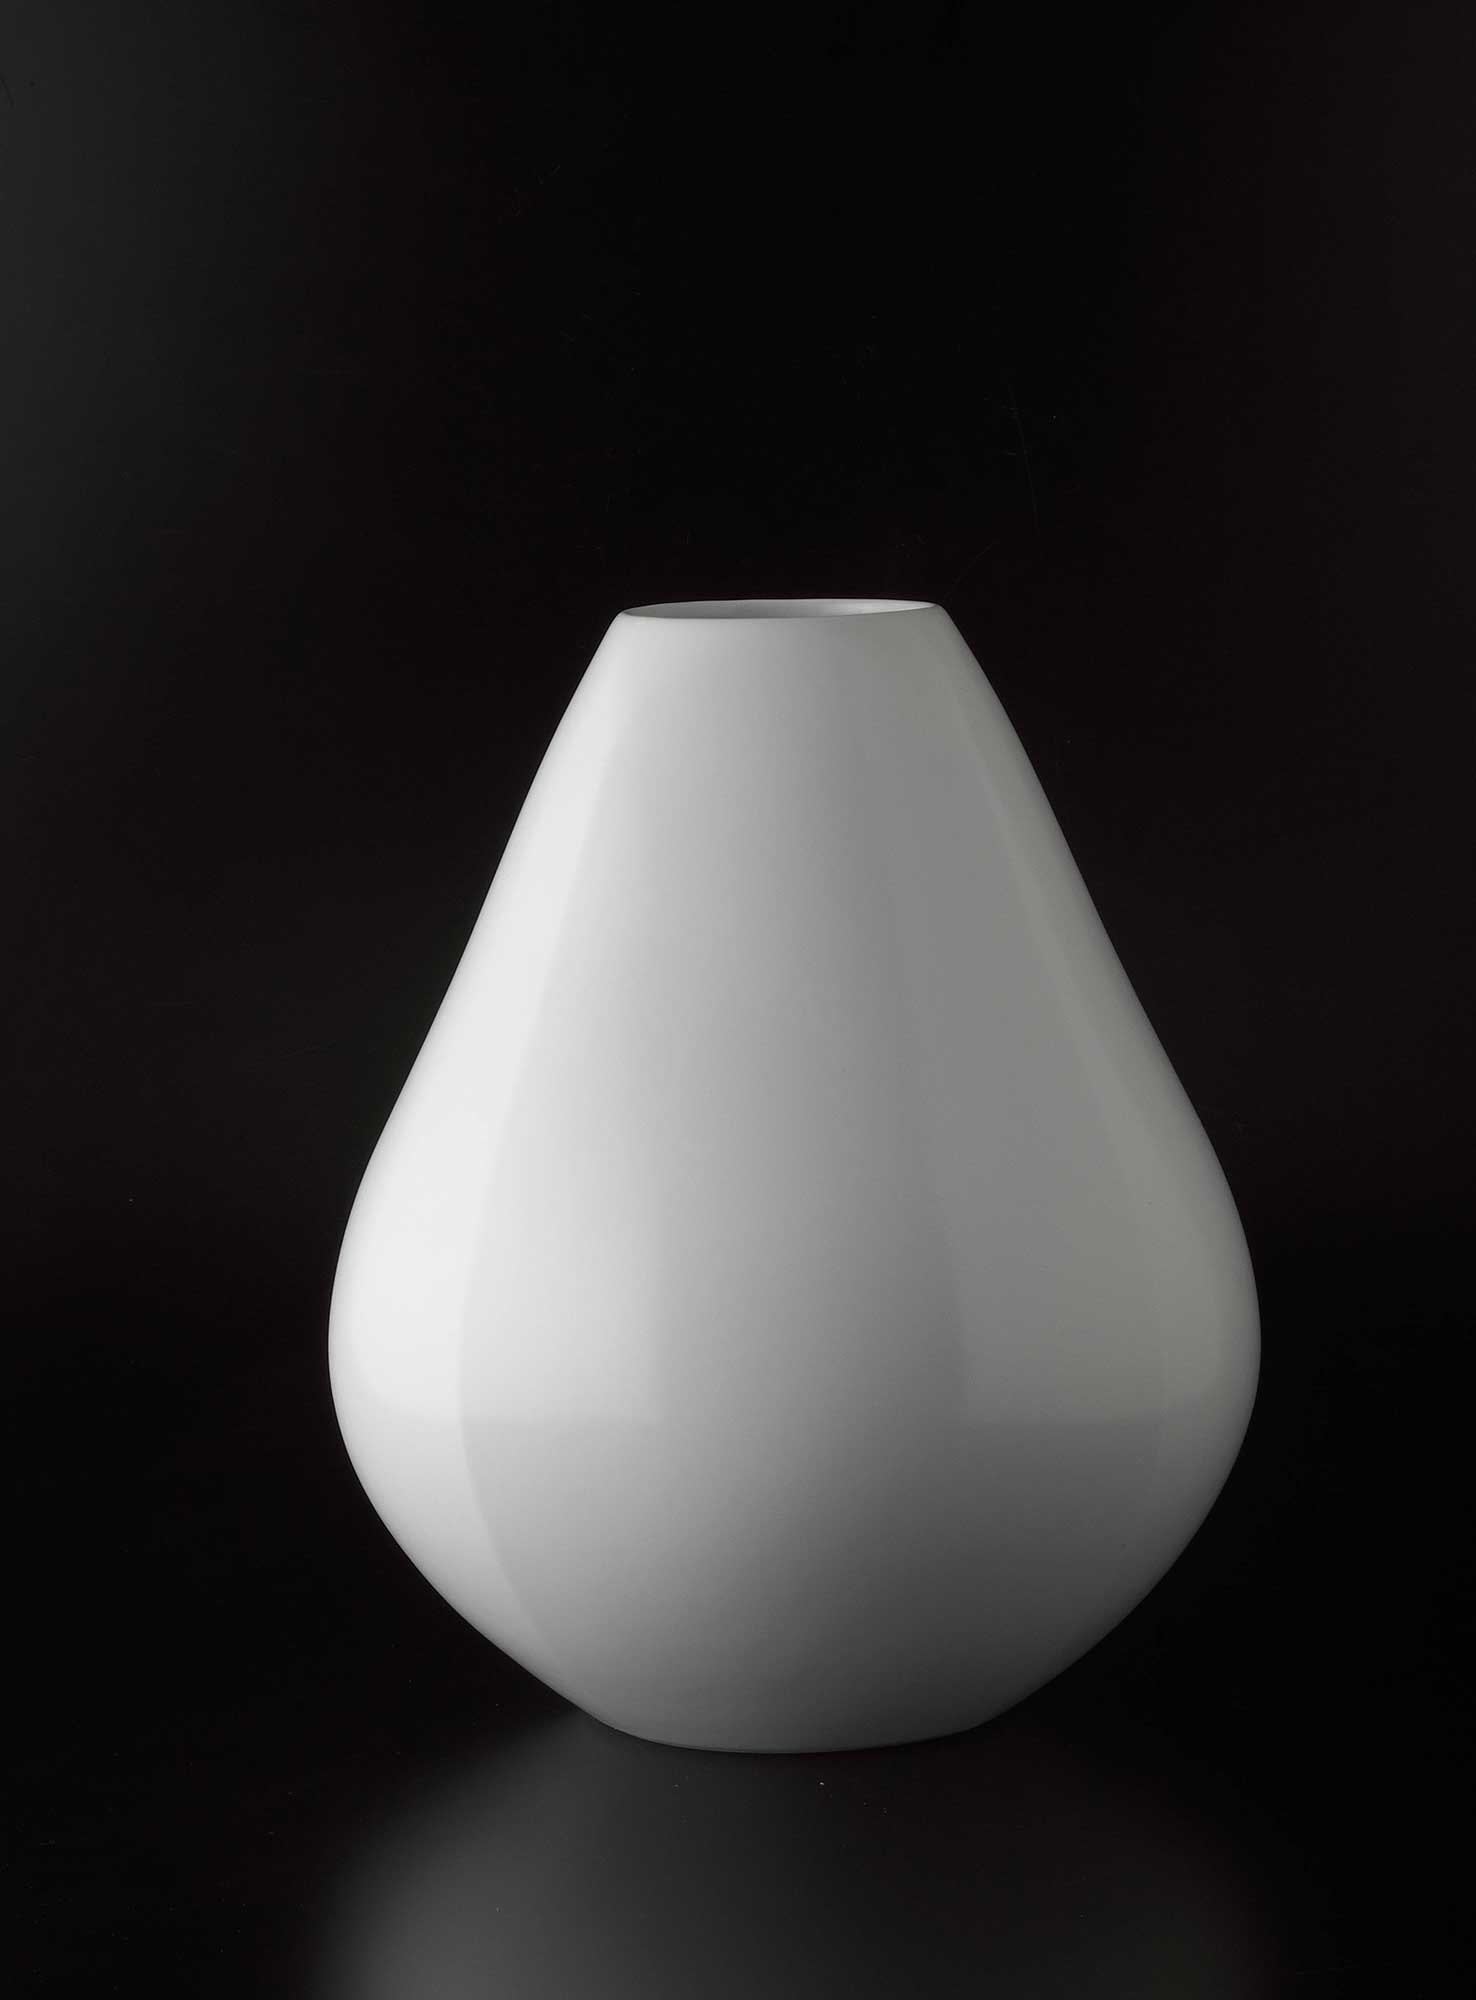 White Porcelain Faceted Vase(2018)